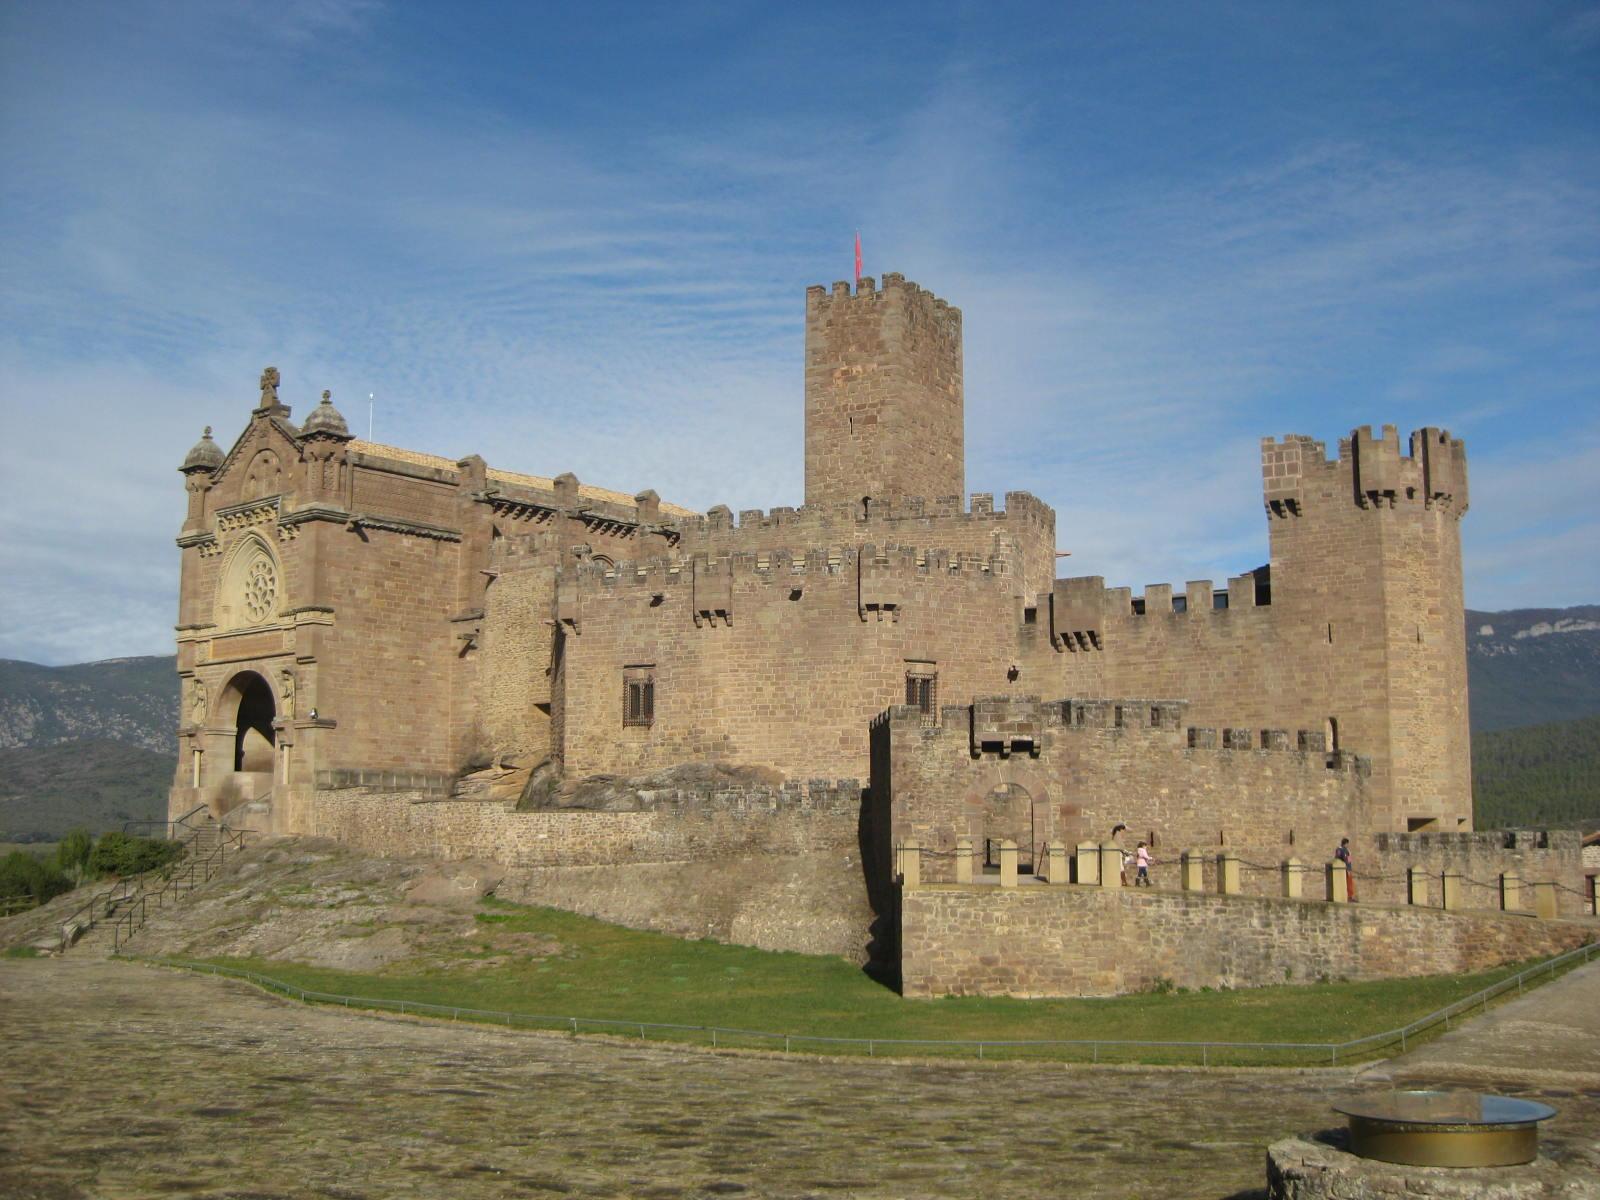 Castillo Javier excursiones navarra baztan bardenas olite irati camino santiago